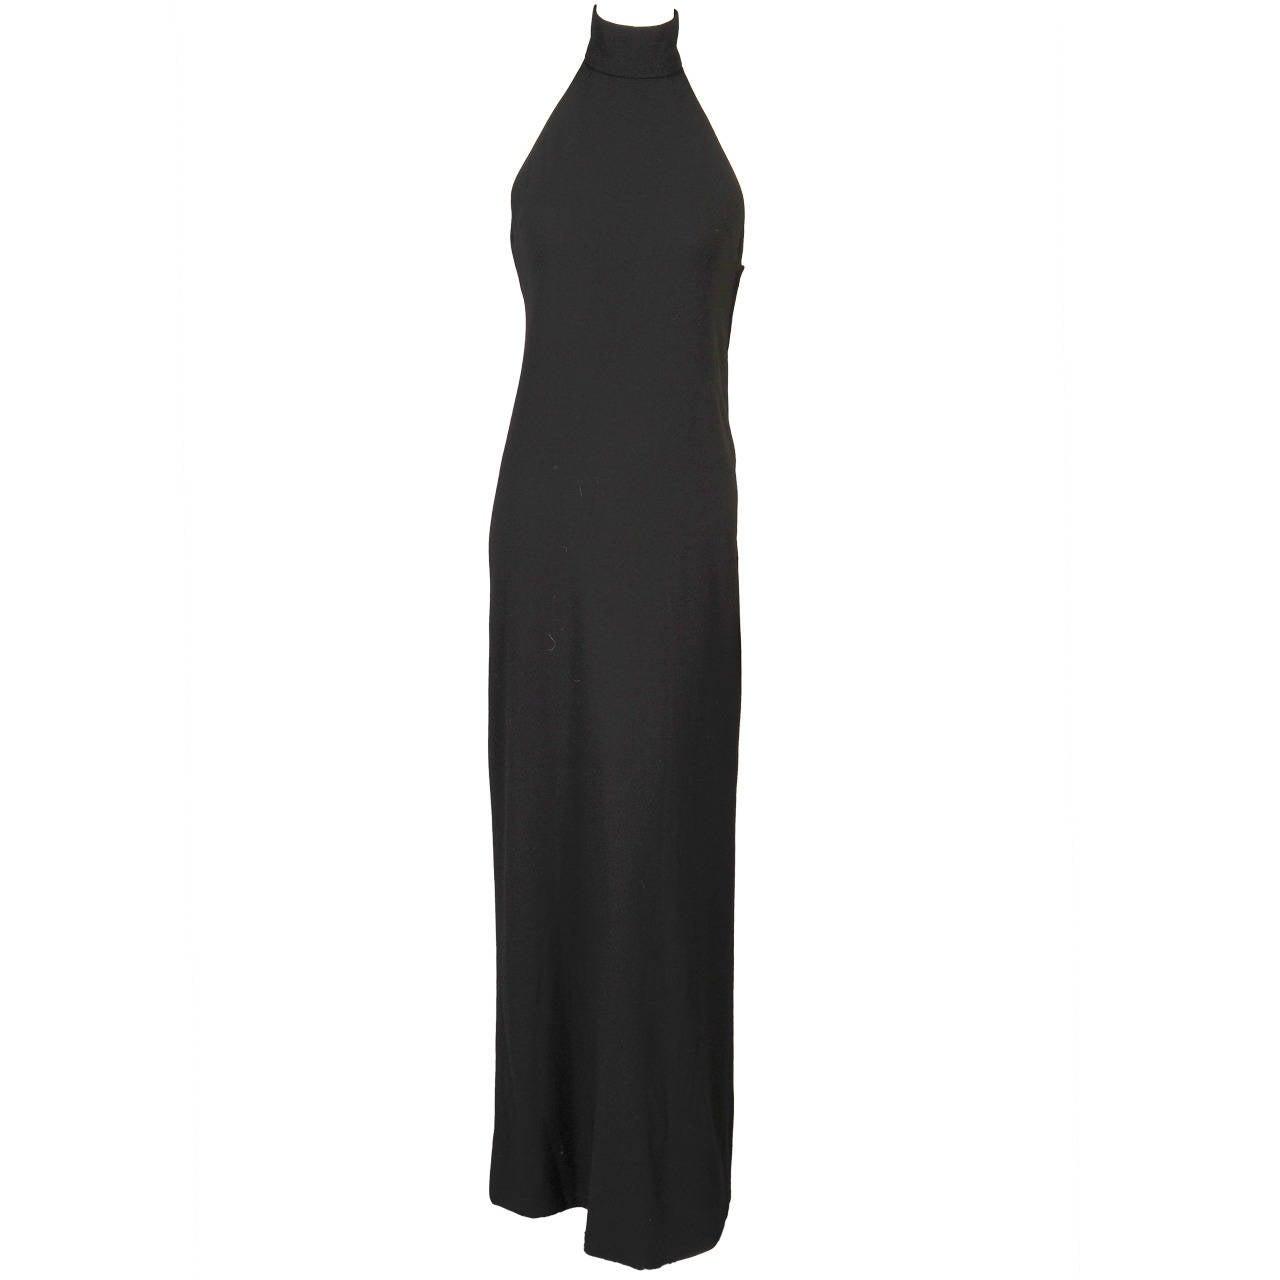 1960's Norman Norell Elegant Black Halter Dress, ex Model & Muse Denise